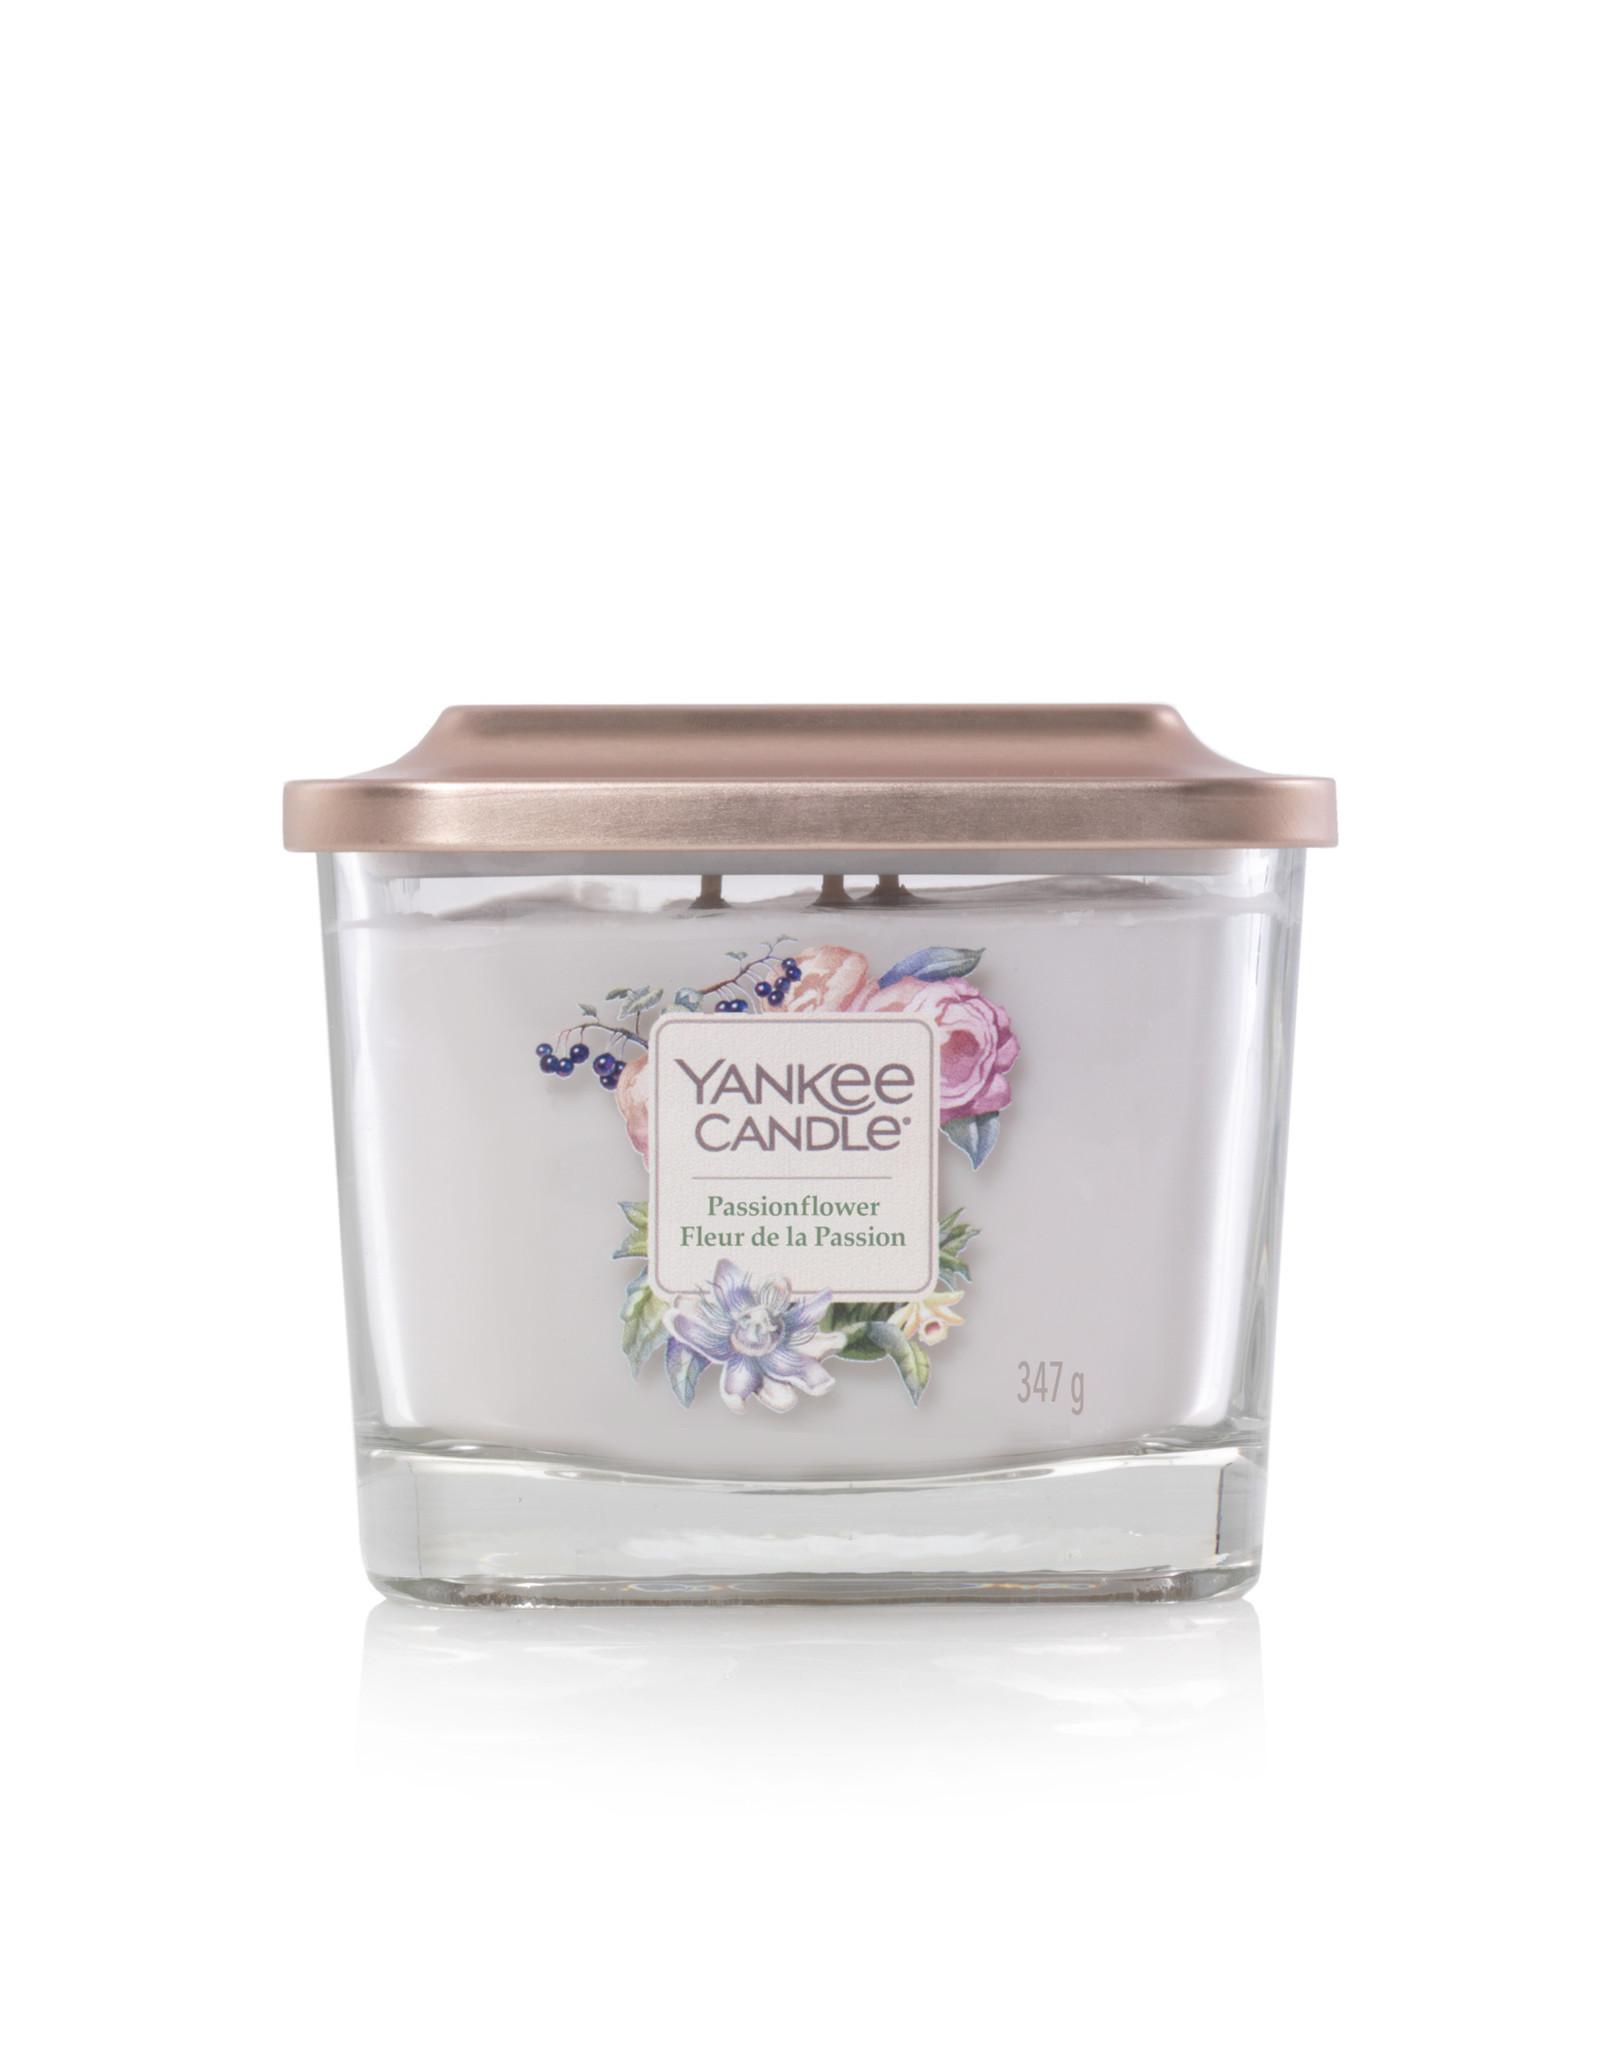 Yankee Candle Passionflower - Medium Vessel